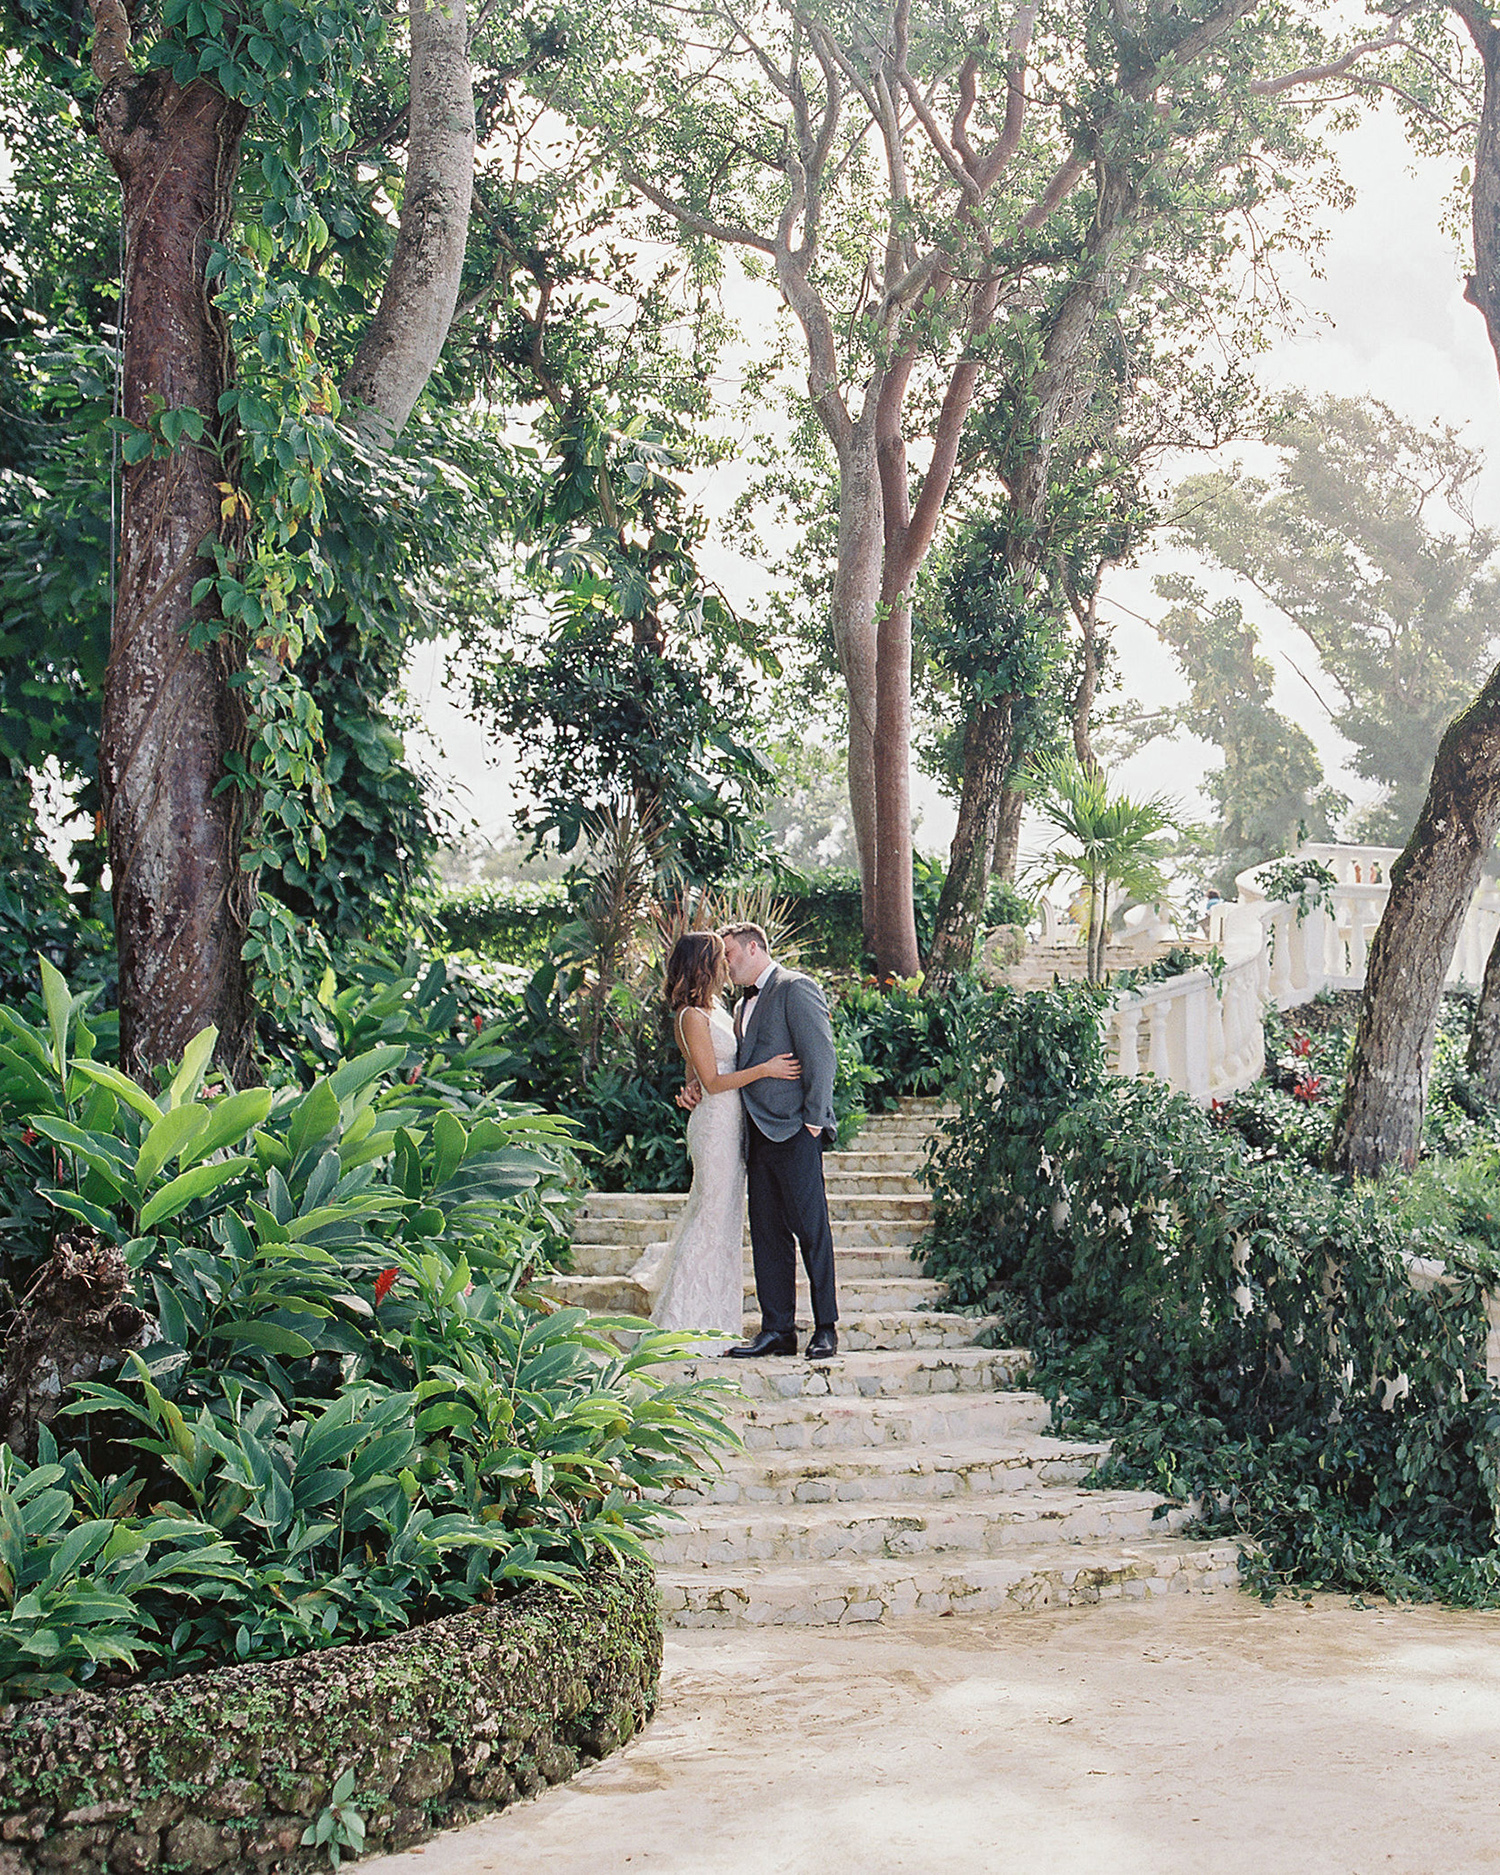 jessica ryan wedding couple kissing on stairway in lush garden